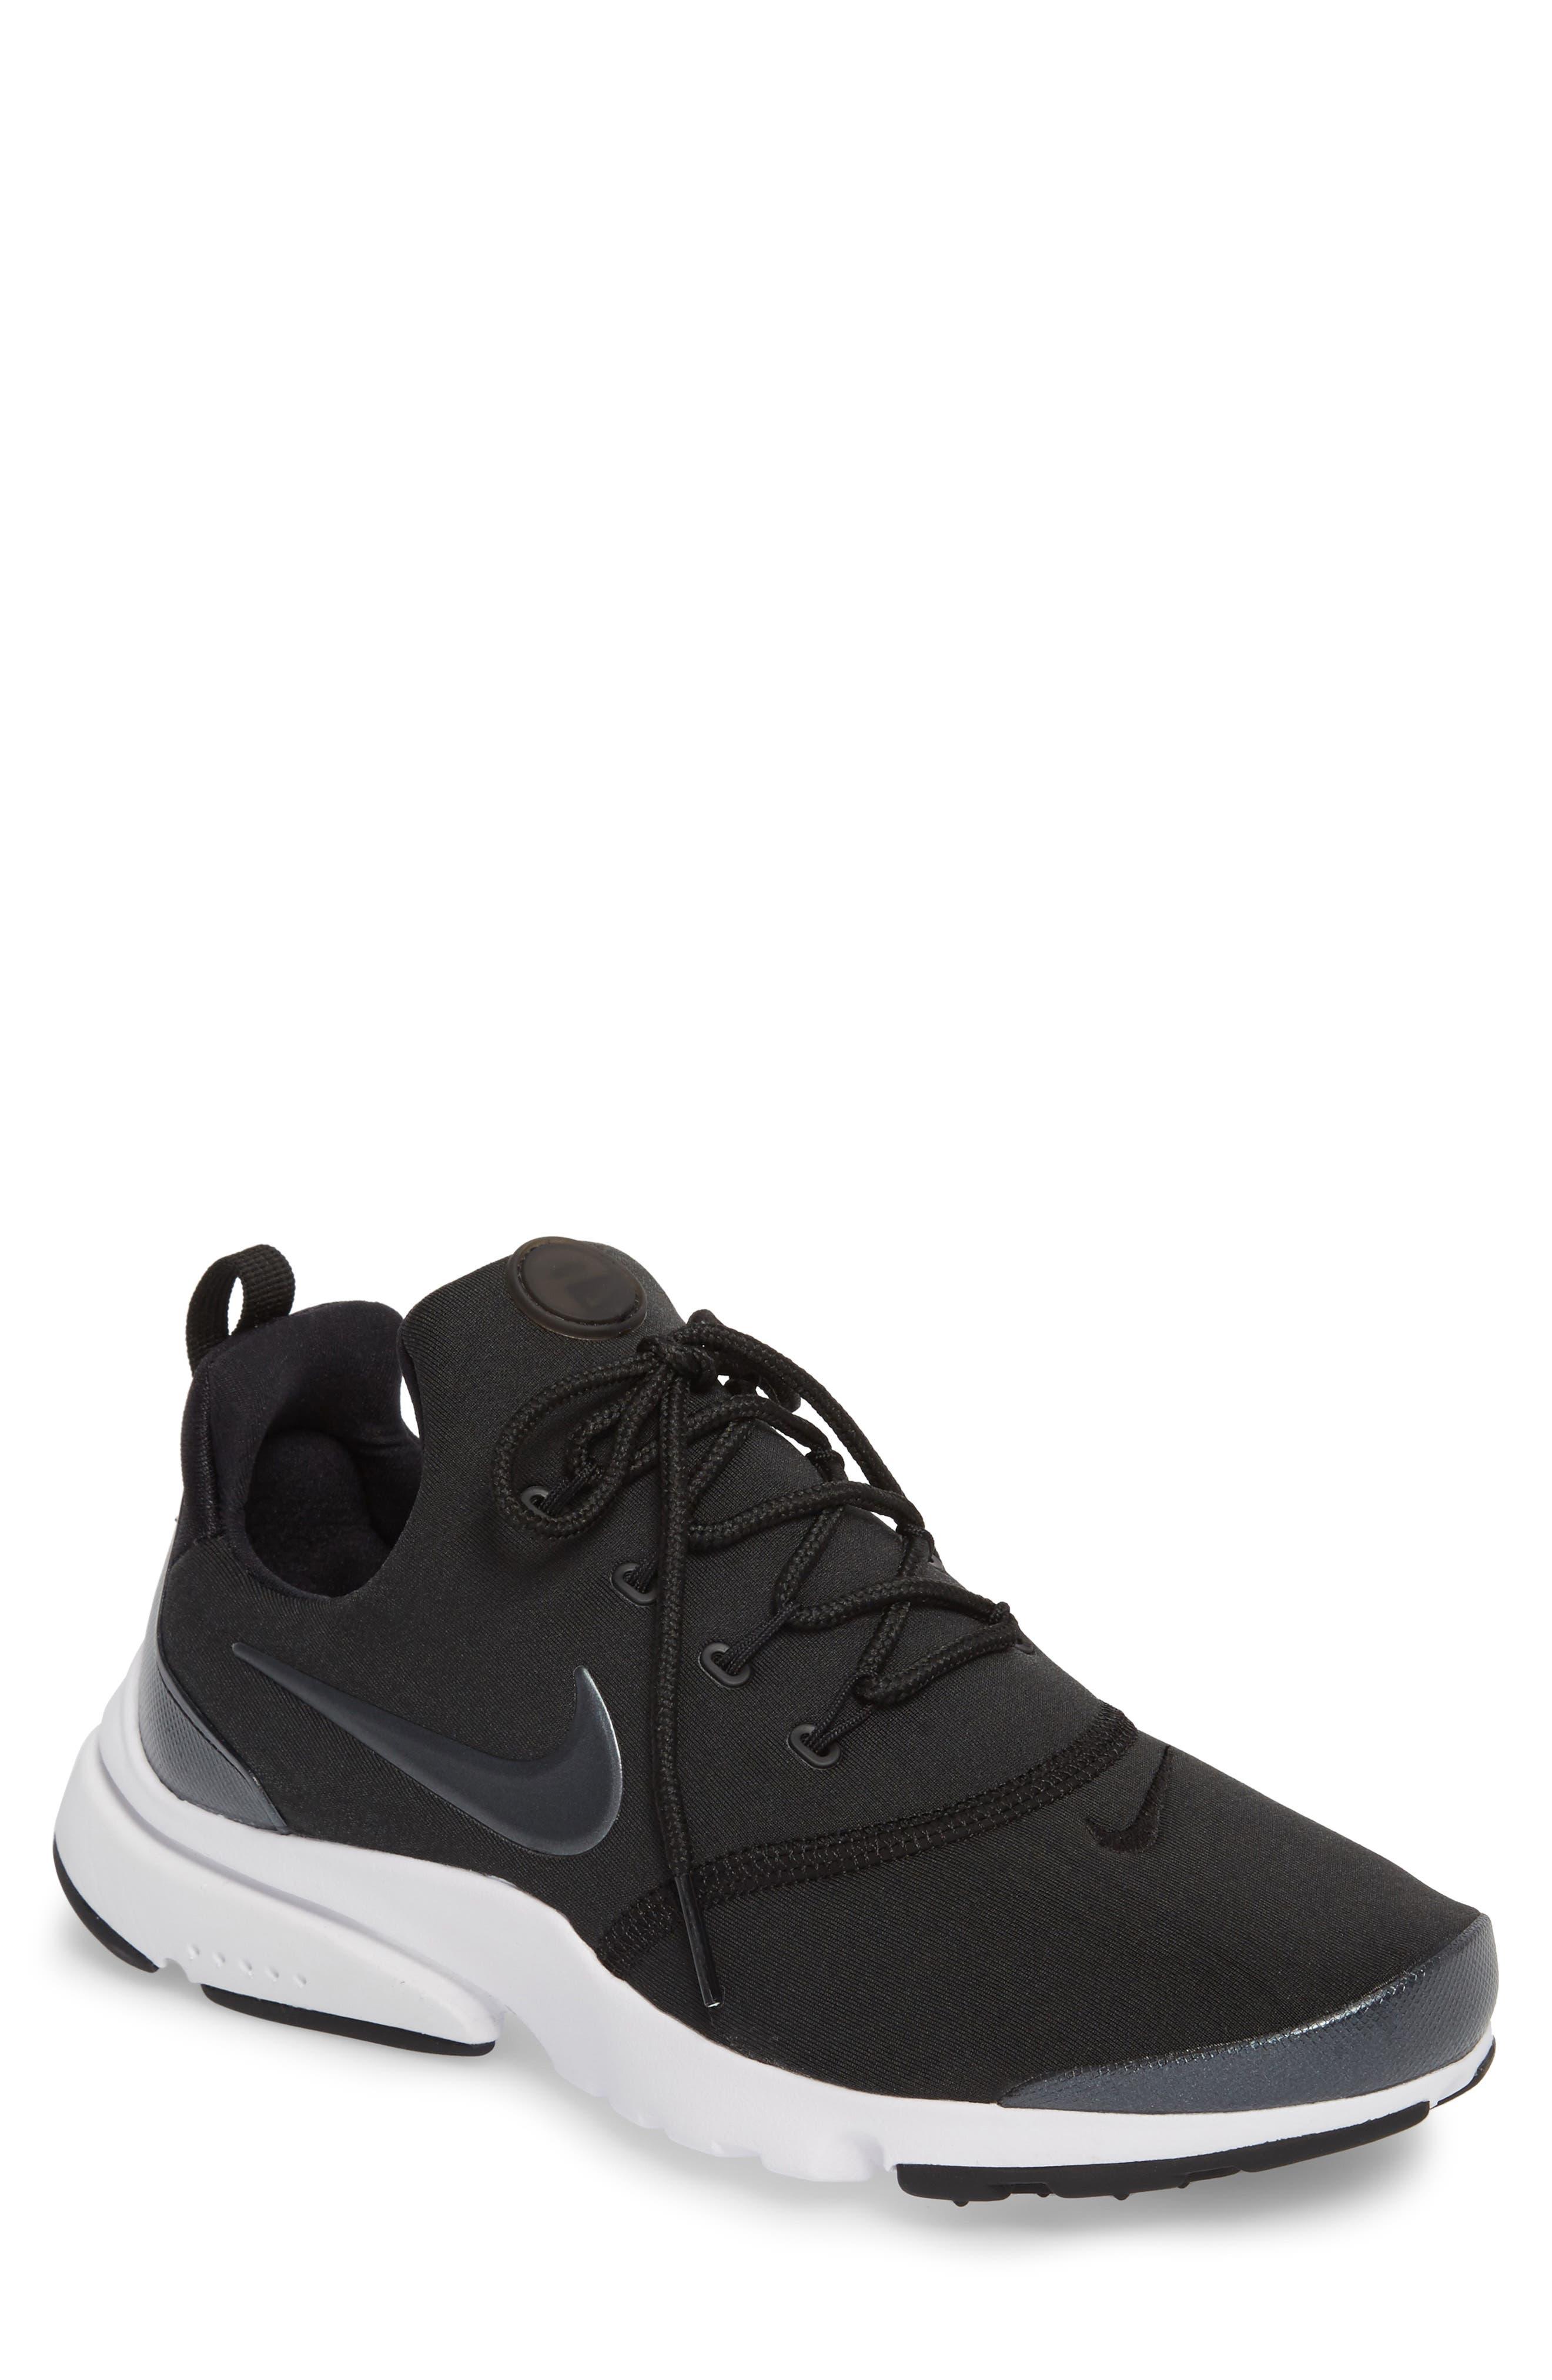 Presto Ultra SE Sneaker,                             Main thumbnail 1, color,                             003